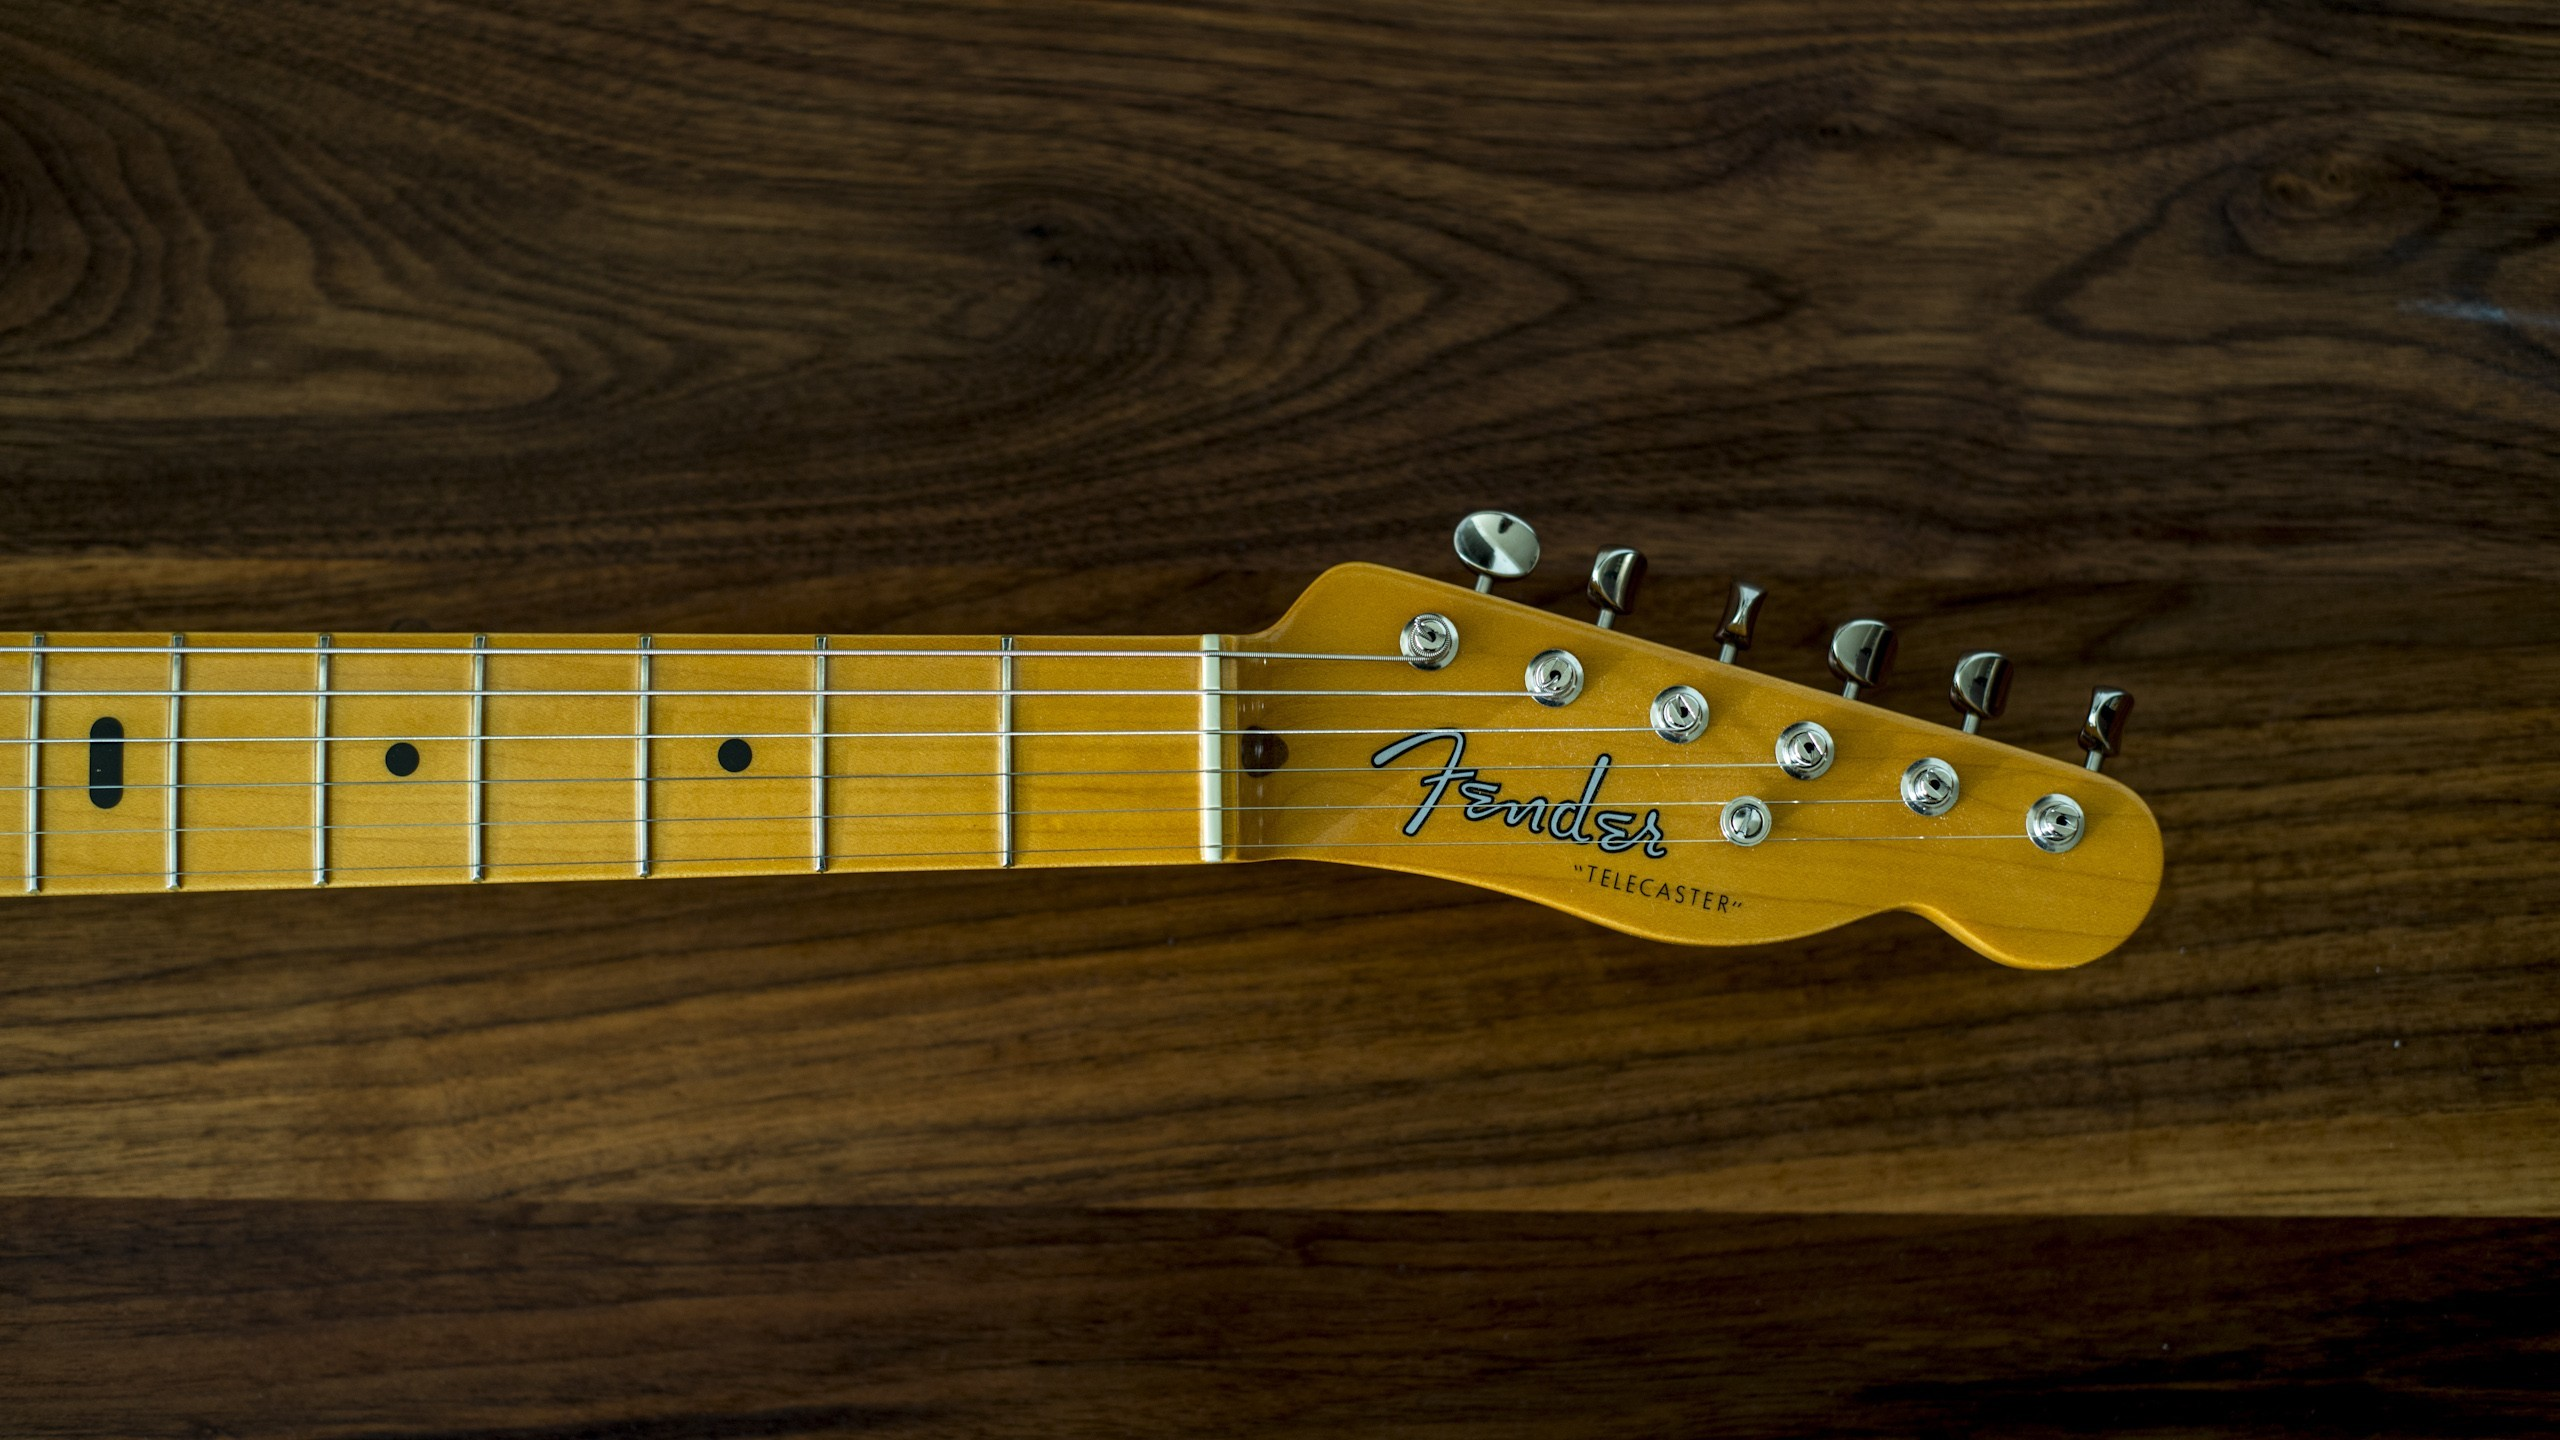 Fender Wallpaper HD 2560x1440